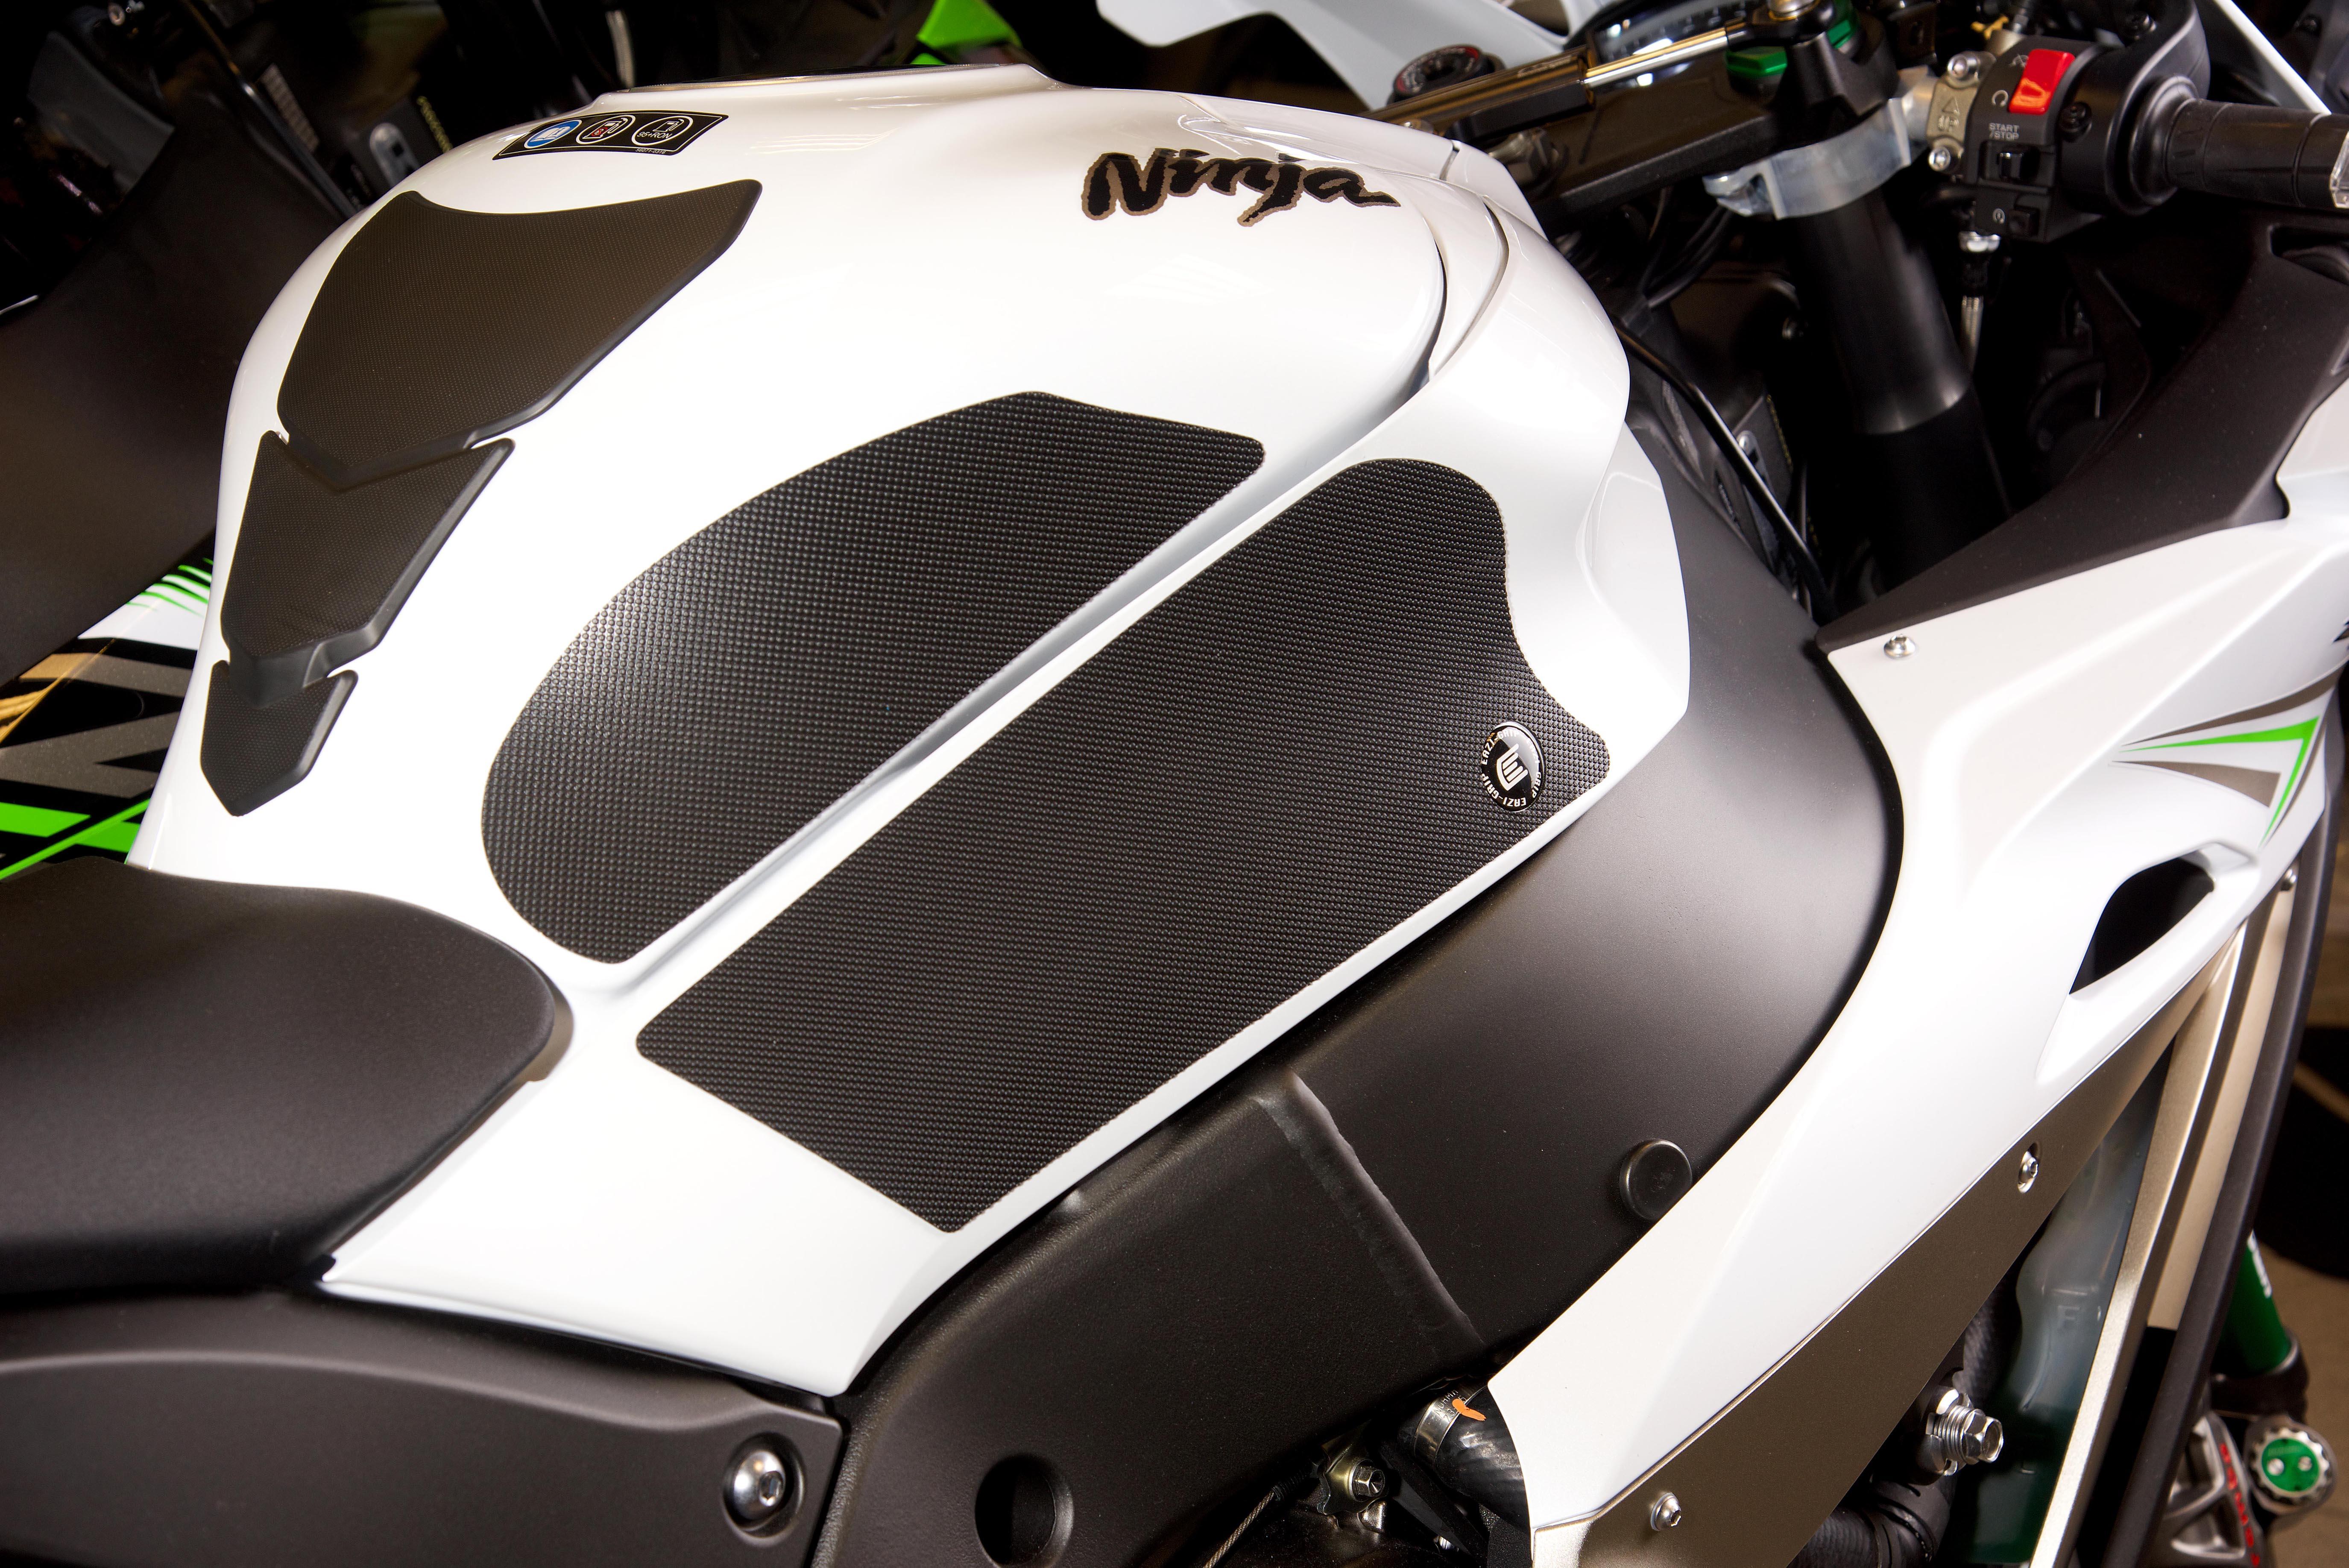 ZX10R 2016 Black Evo PRO424